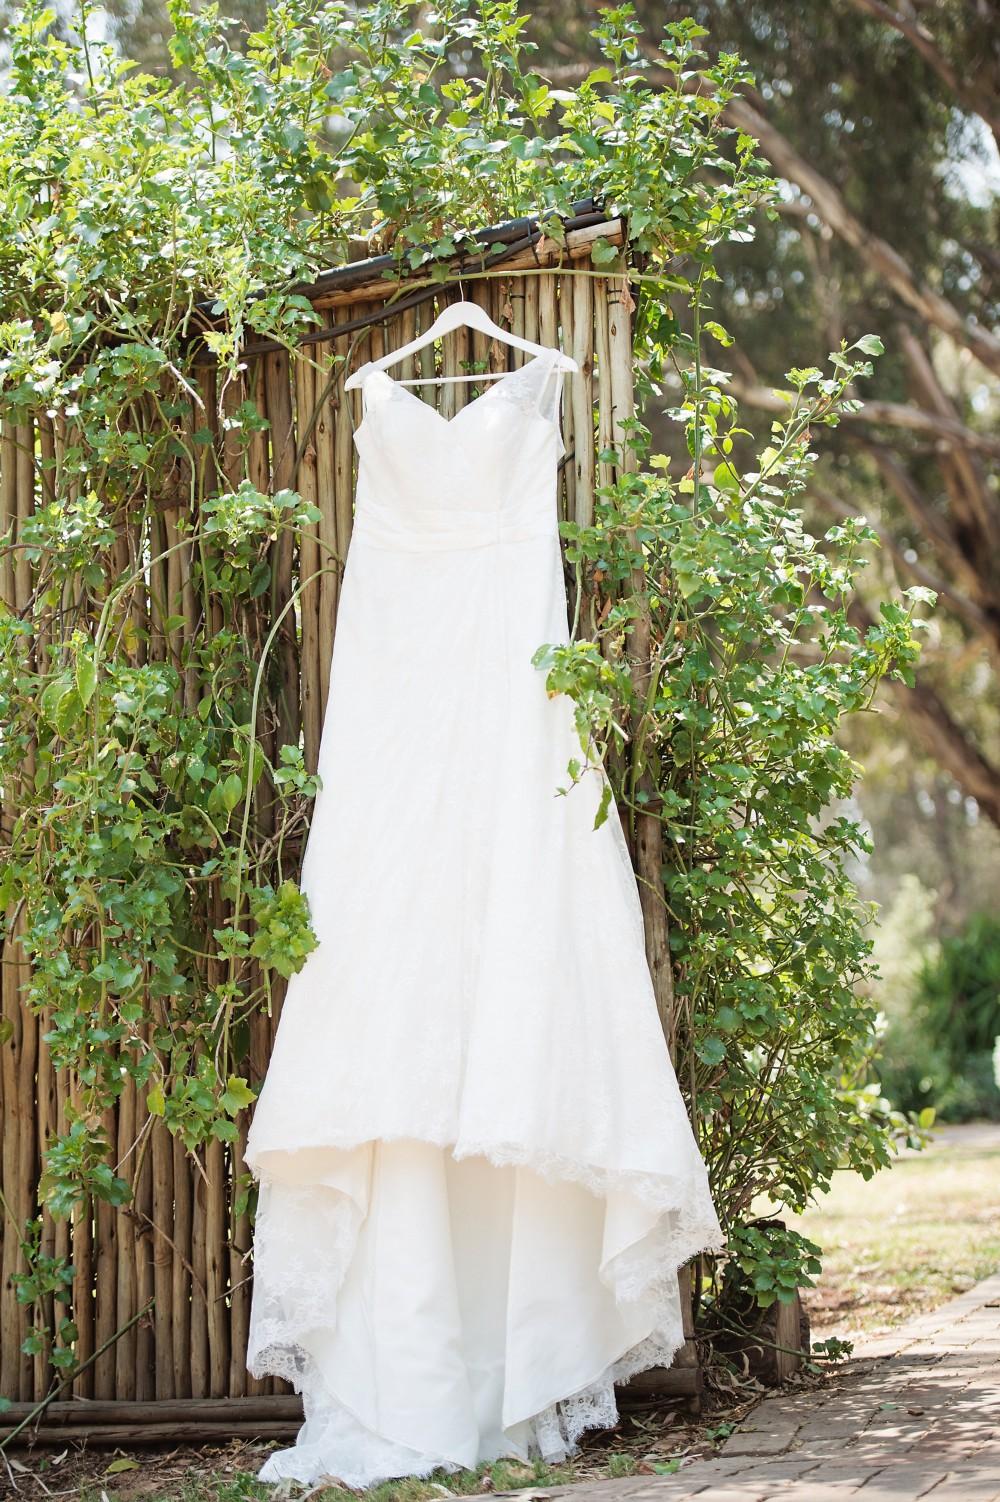 Nicole spose joab14025iv second hand wedding dress on sale for Second hand wedding dresses san diego